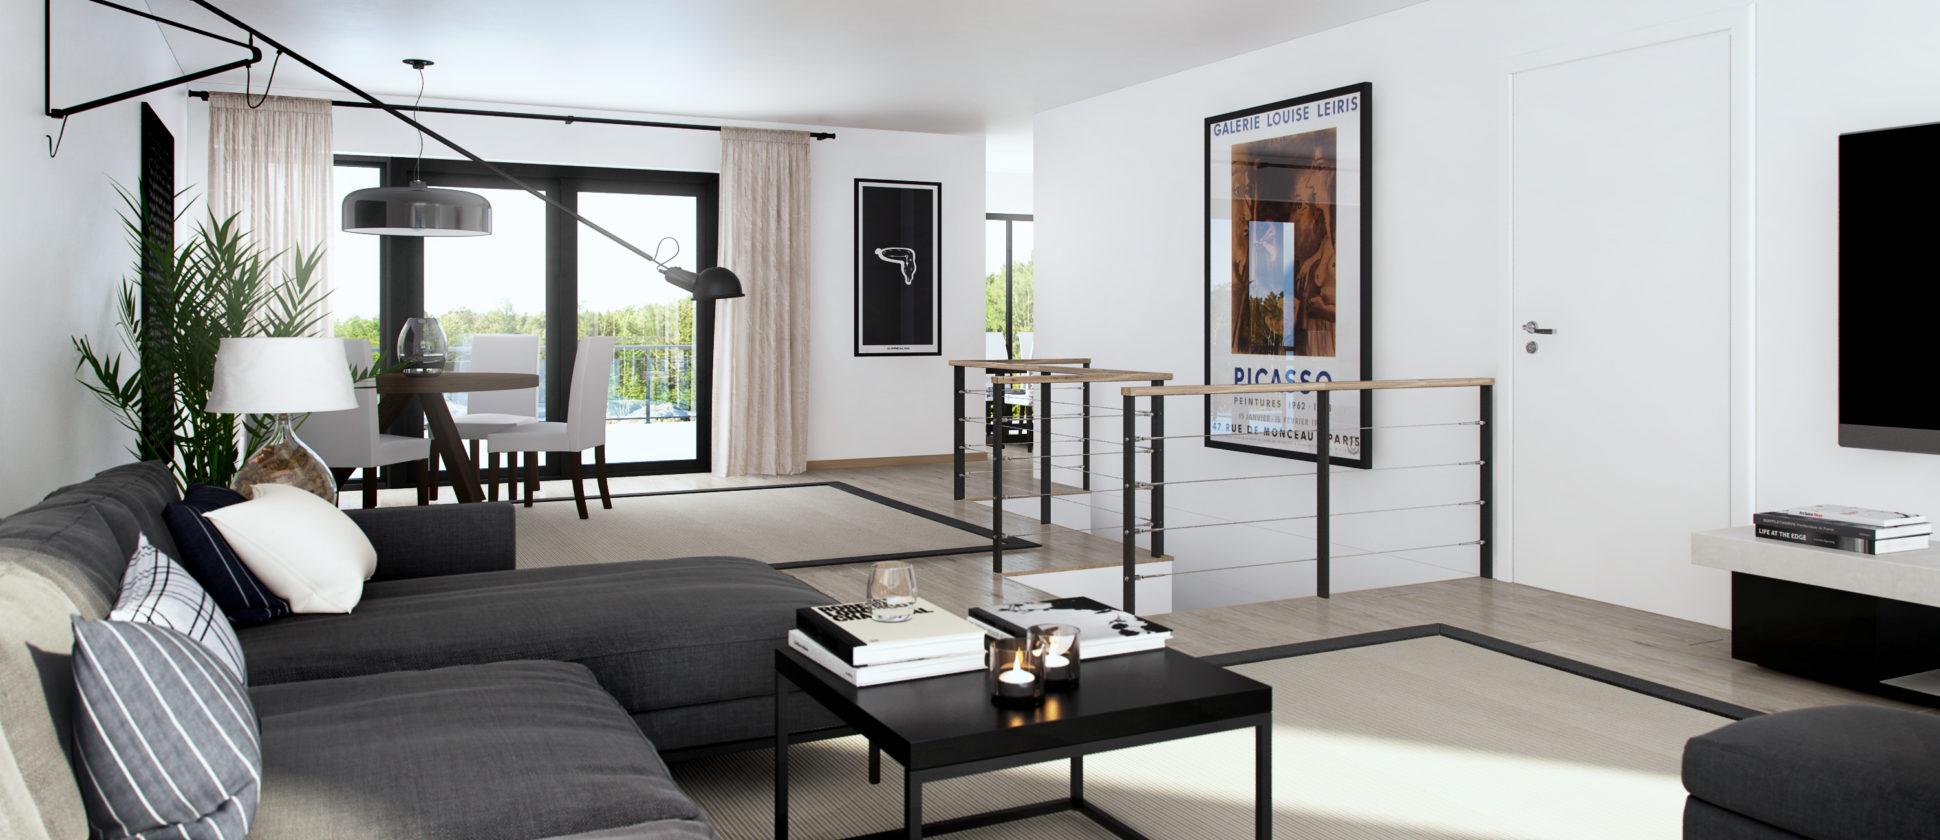 Verdien av 3D-rendering i boligbransjen